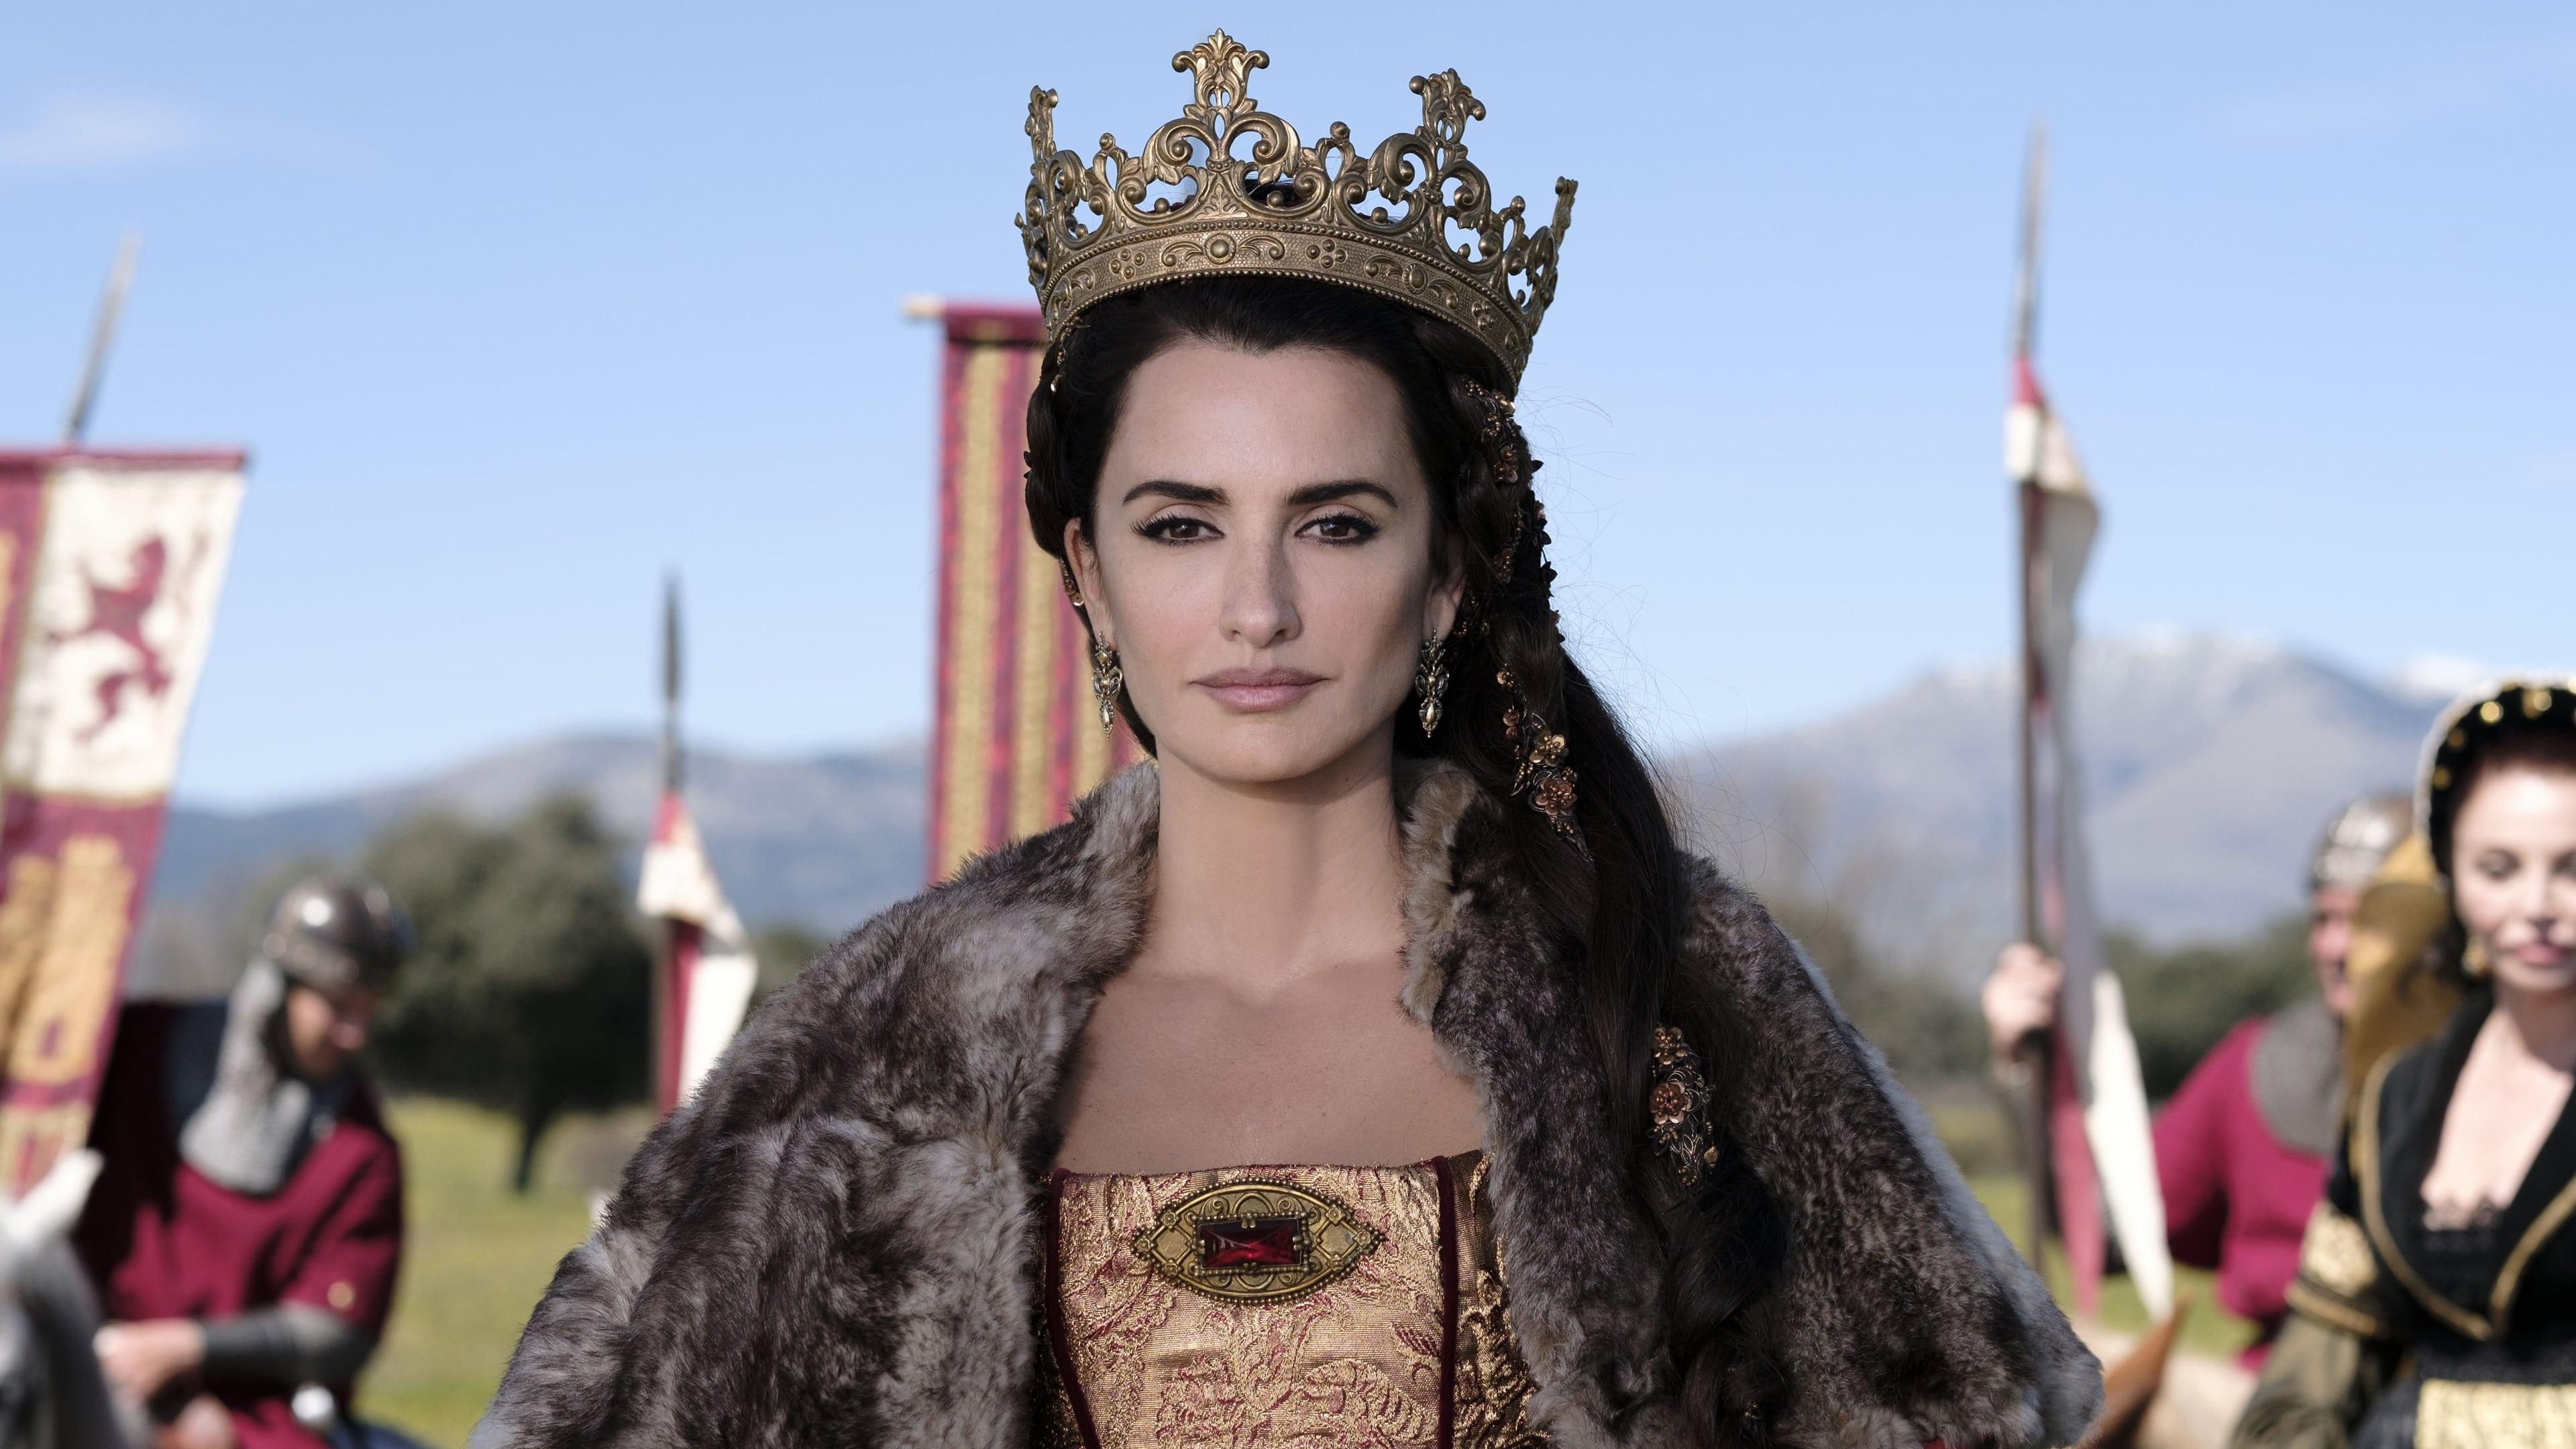 La Reine d'Espagne Film Streaming (2016)